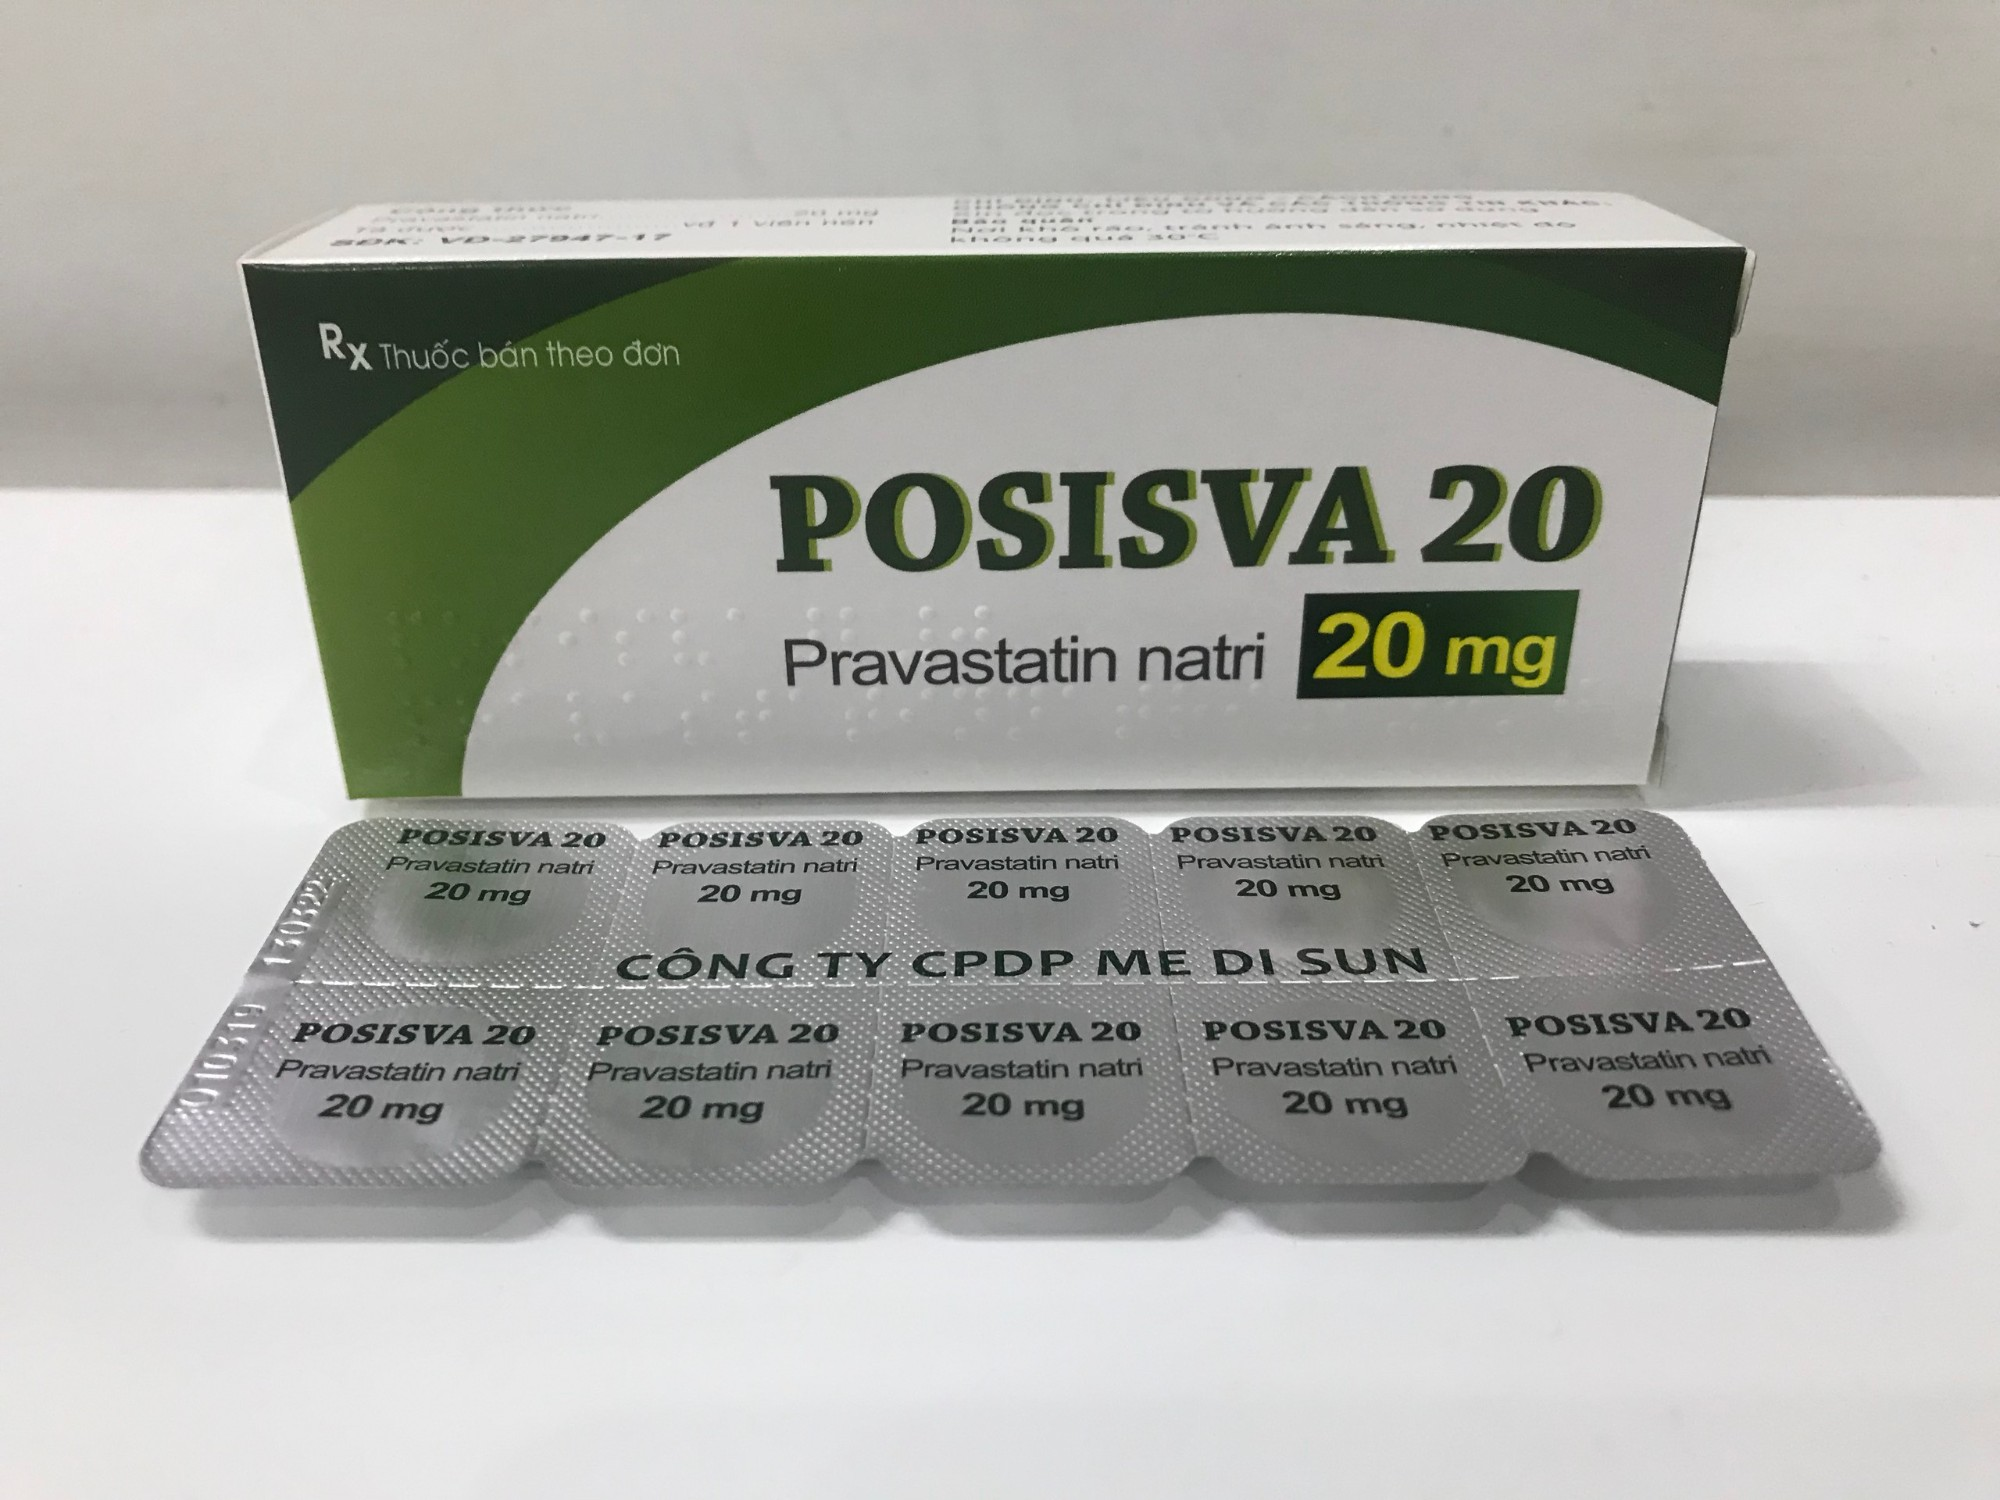 POSISVA 20 (Pravastatin 20mg)